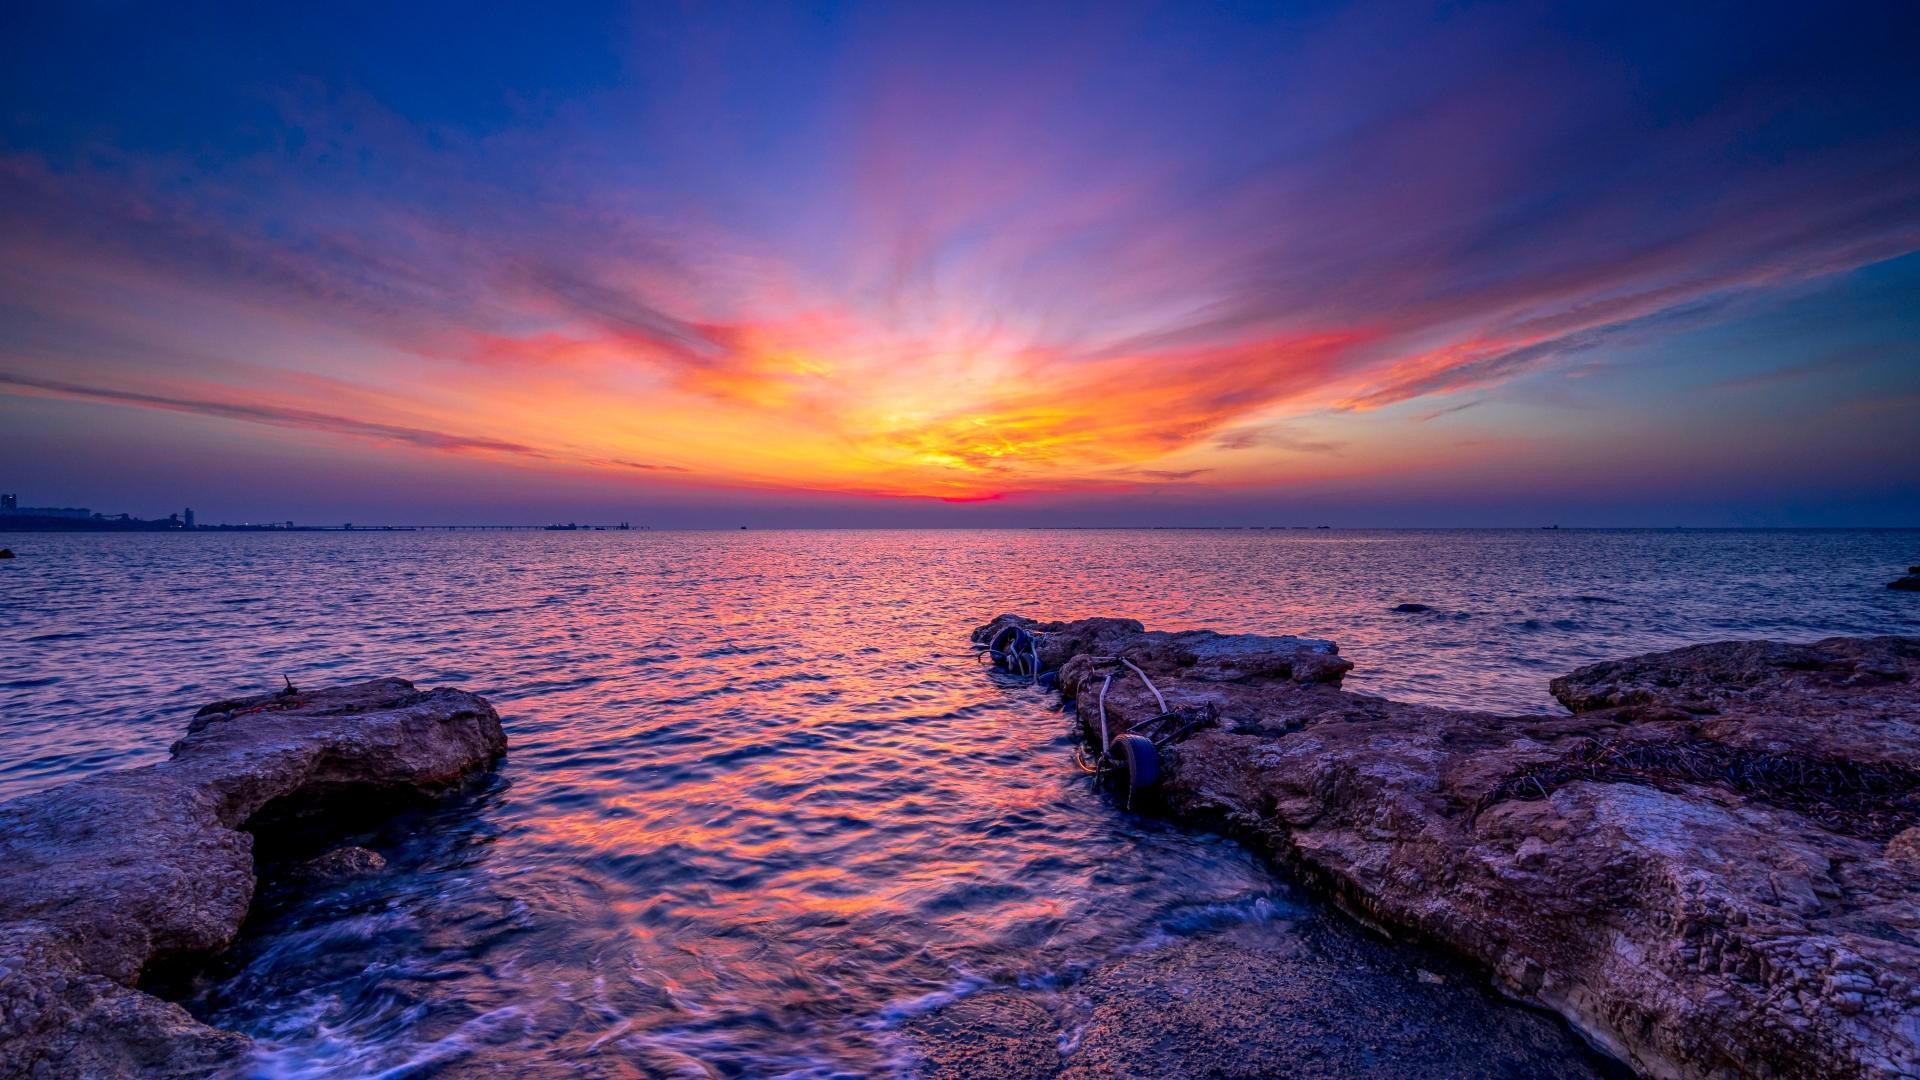 1920x1080 Mediterranean Sea Sunset 1080P Laptop Full HD ...